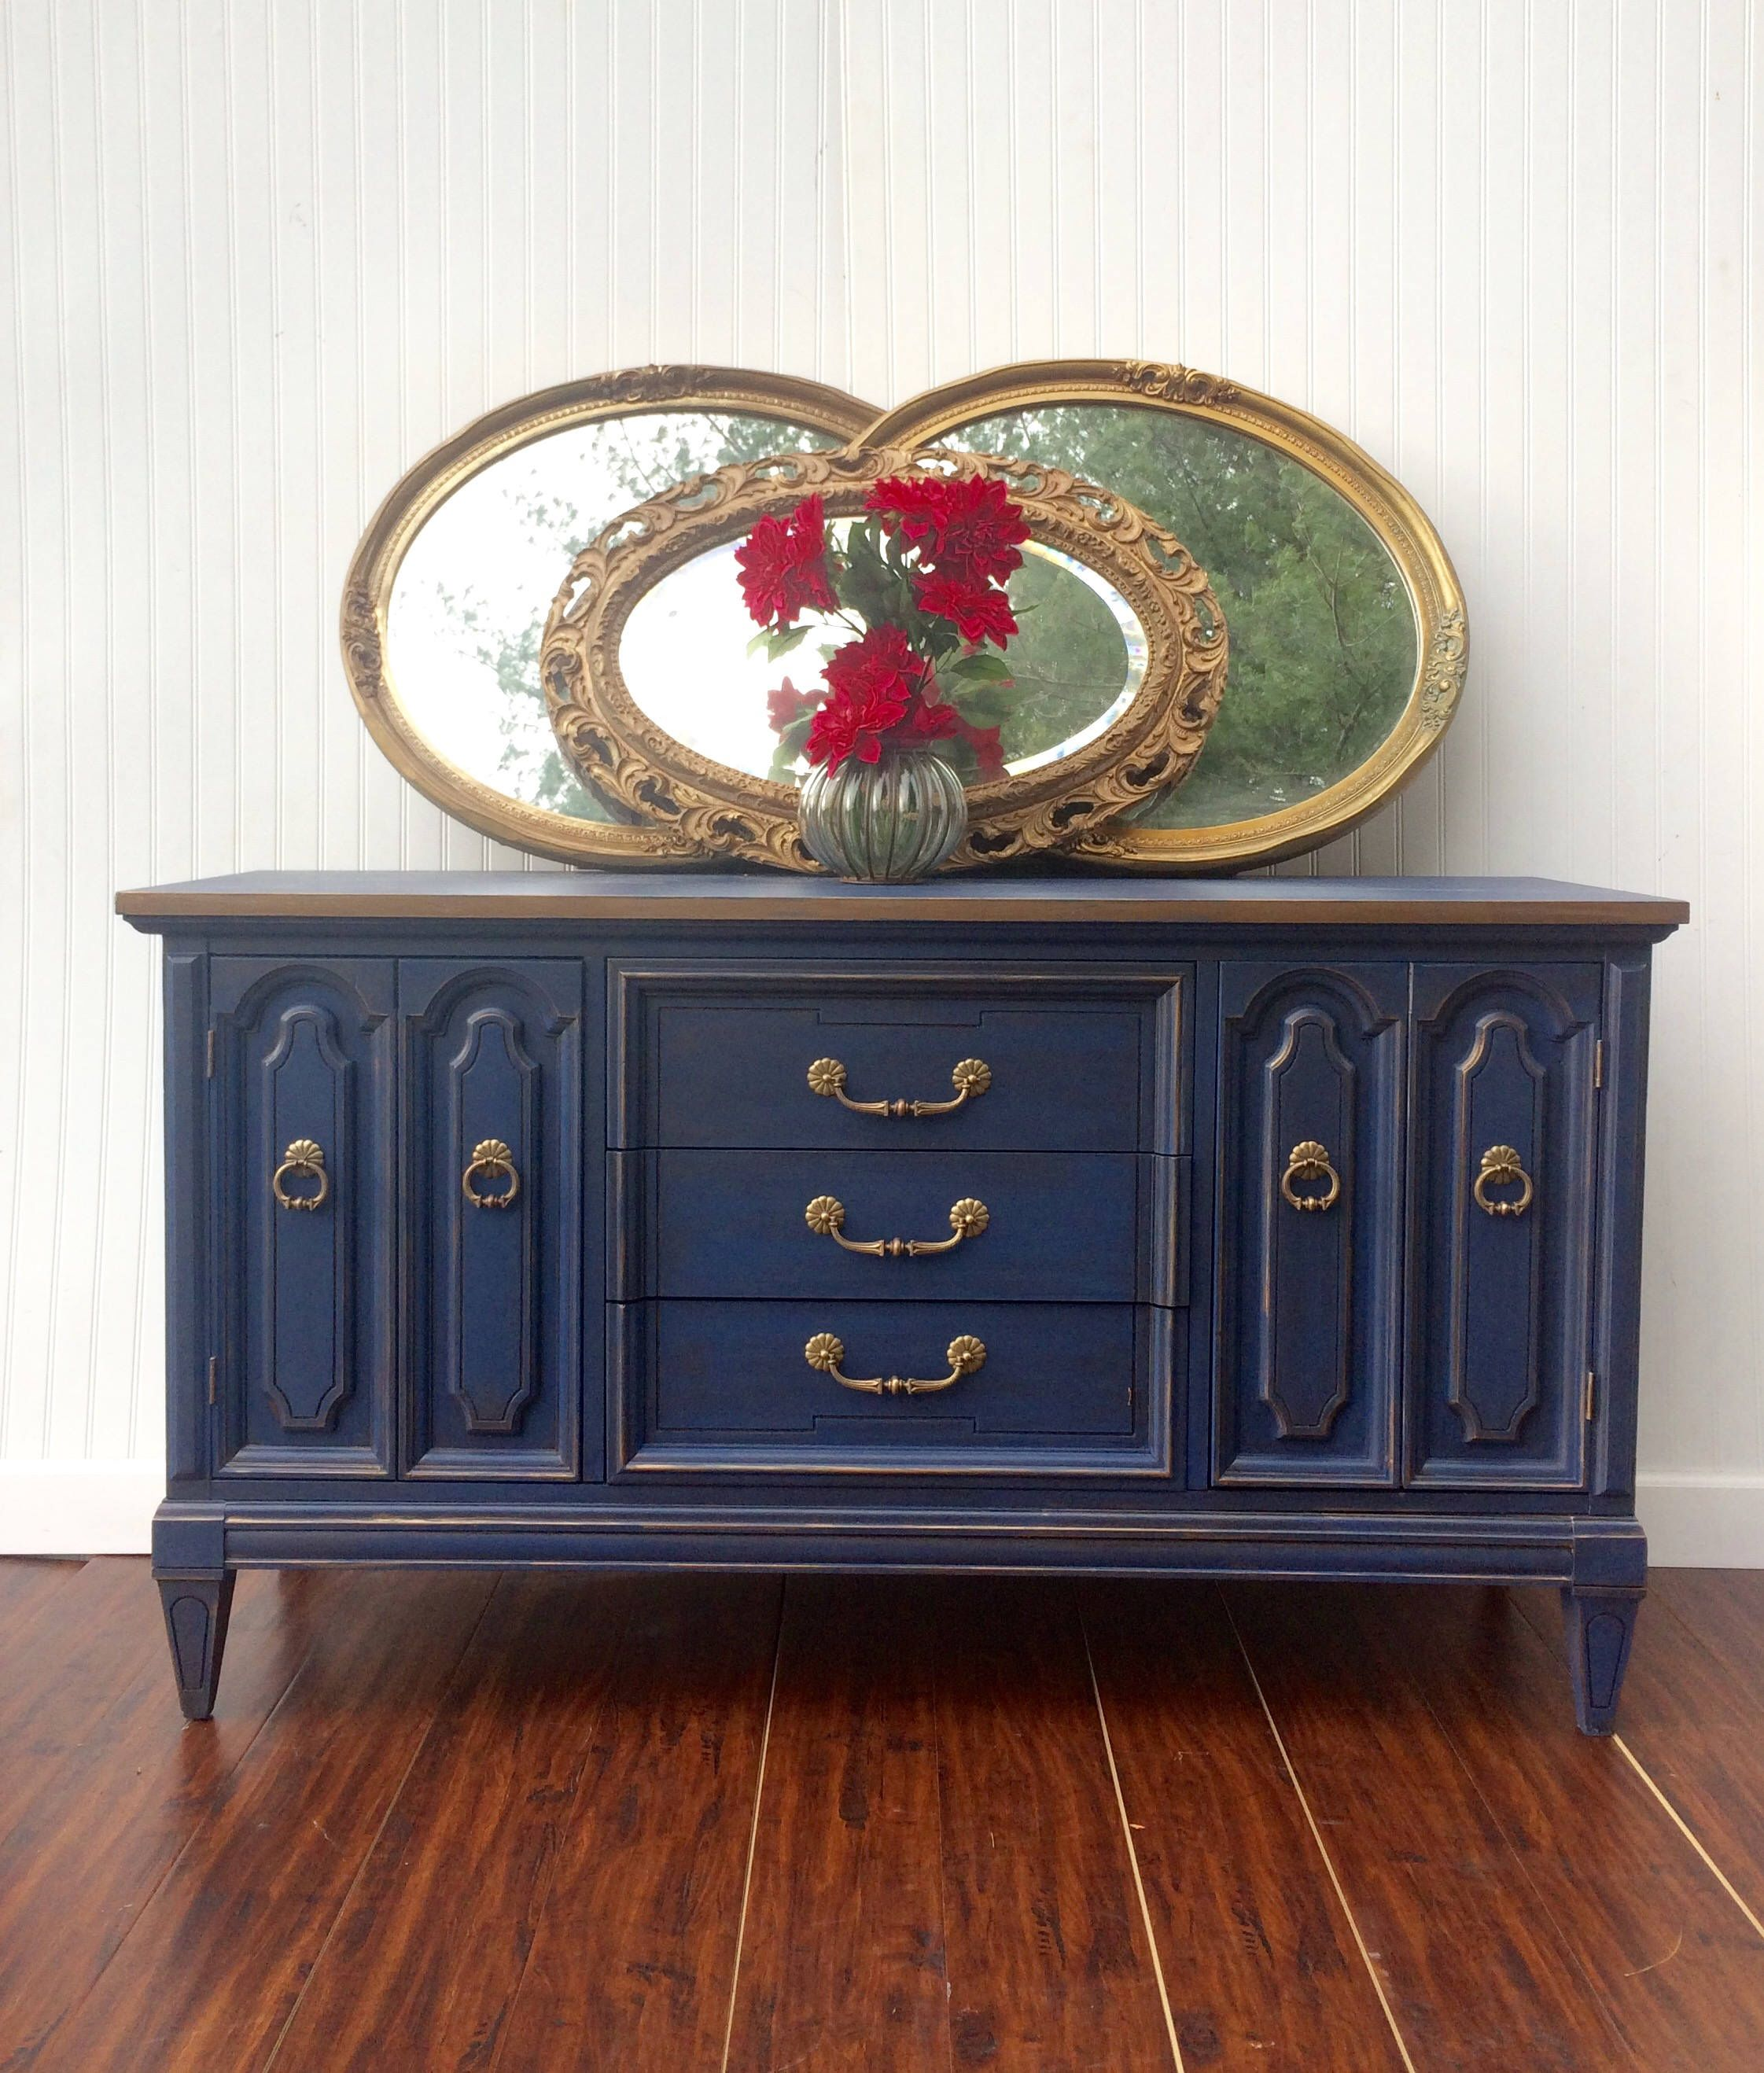 Navy Blue& Metallic Bronze Gold Glazed Antiqued Buffet Sideboard TV Console Credenza Bathroom